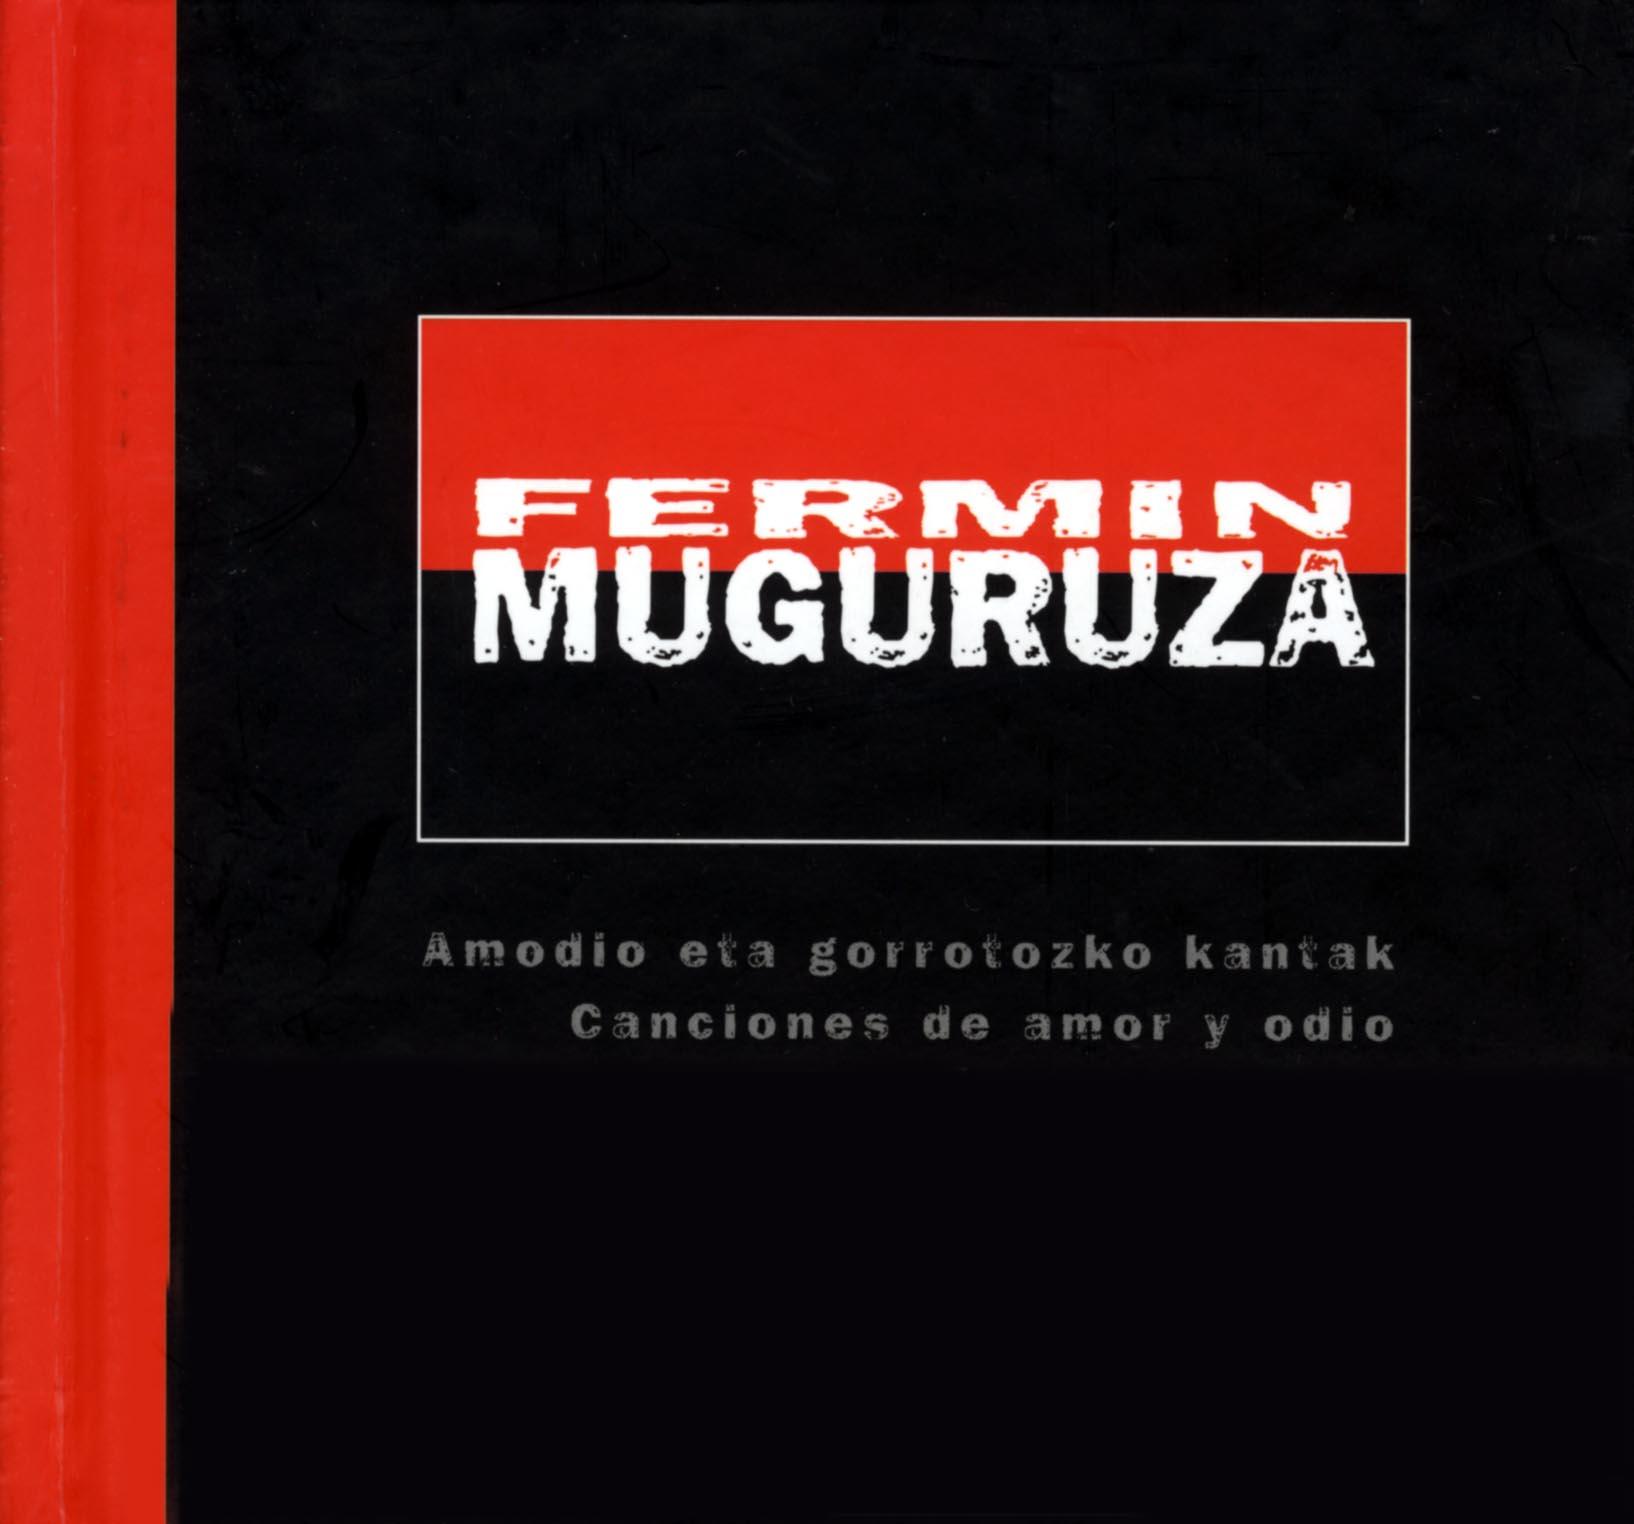 Amodiozko eta gorrotozko kantak (1984-1998)